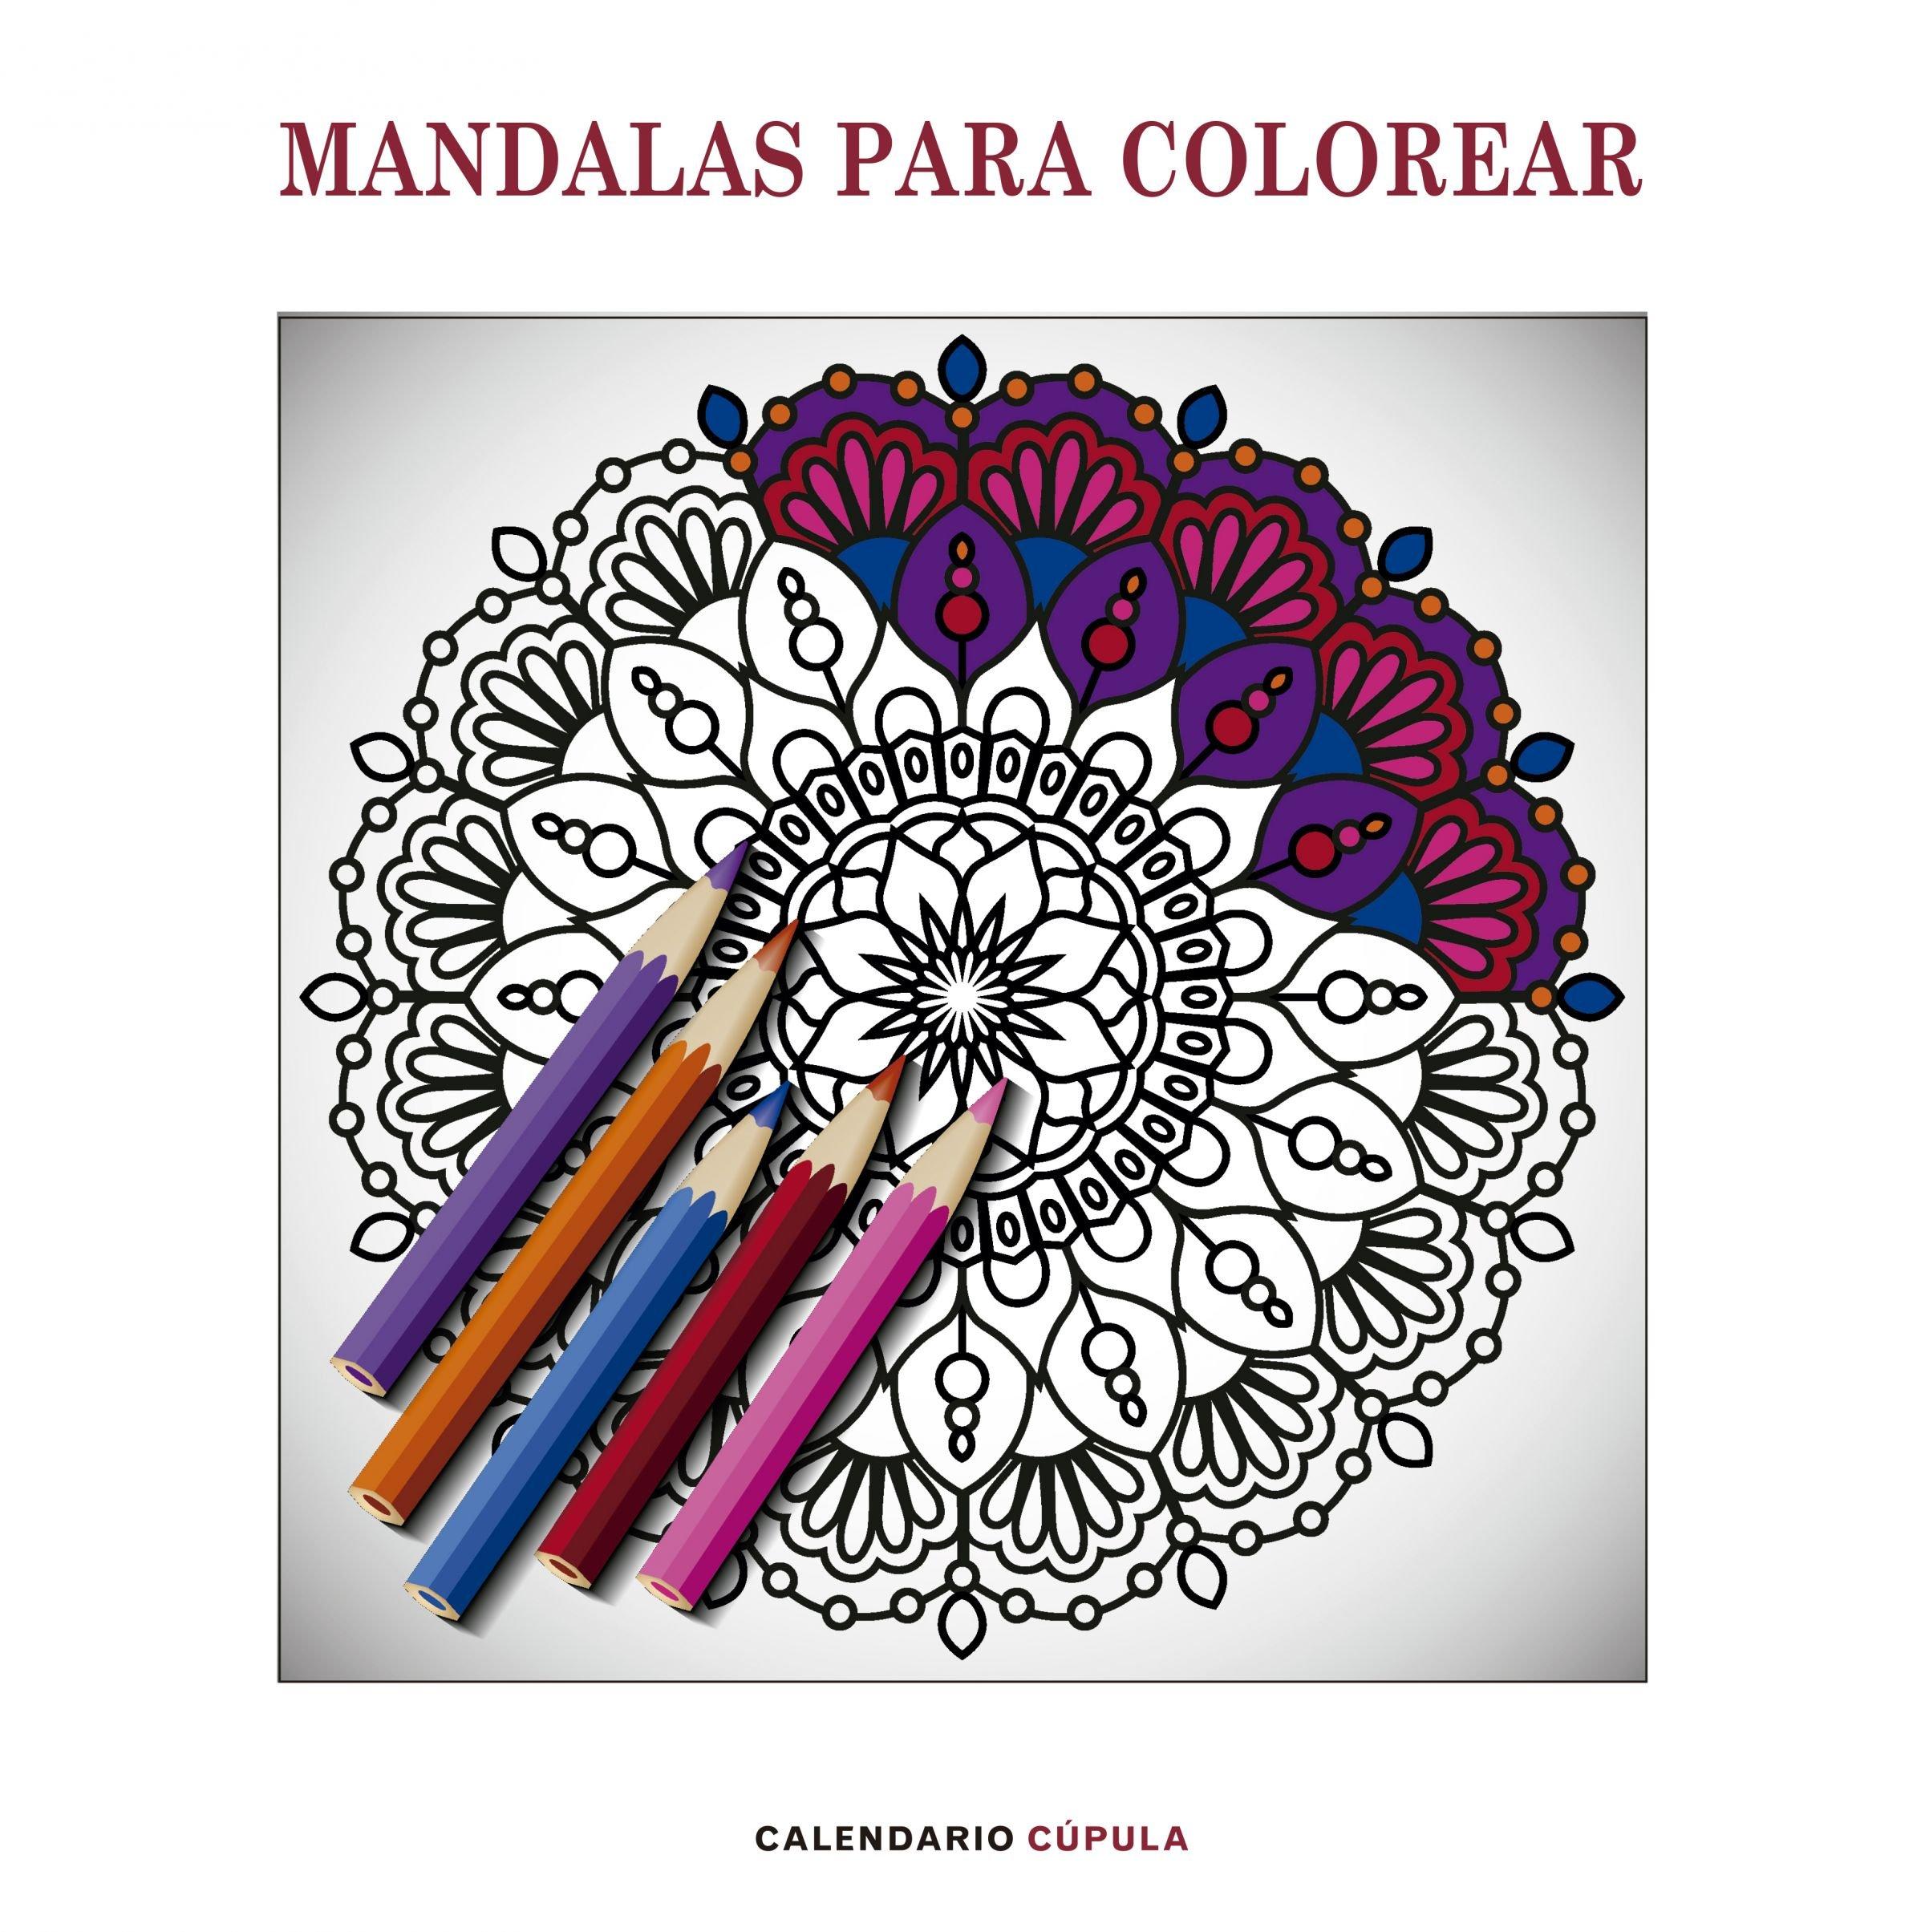 Calendario Mandalas para colorear 2019 Calendarios y agendas ...